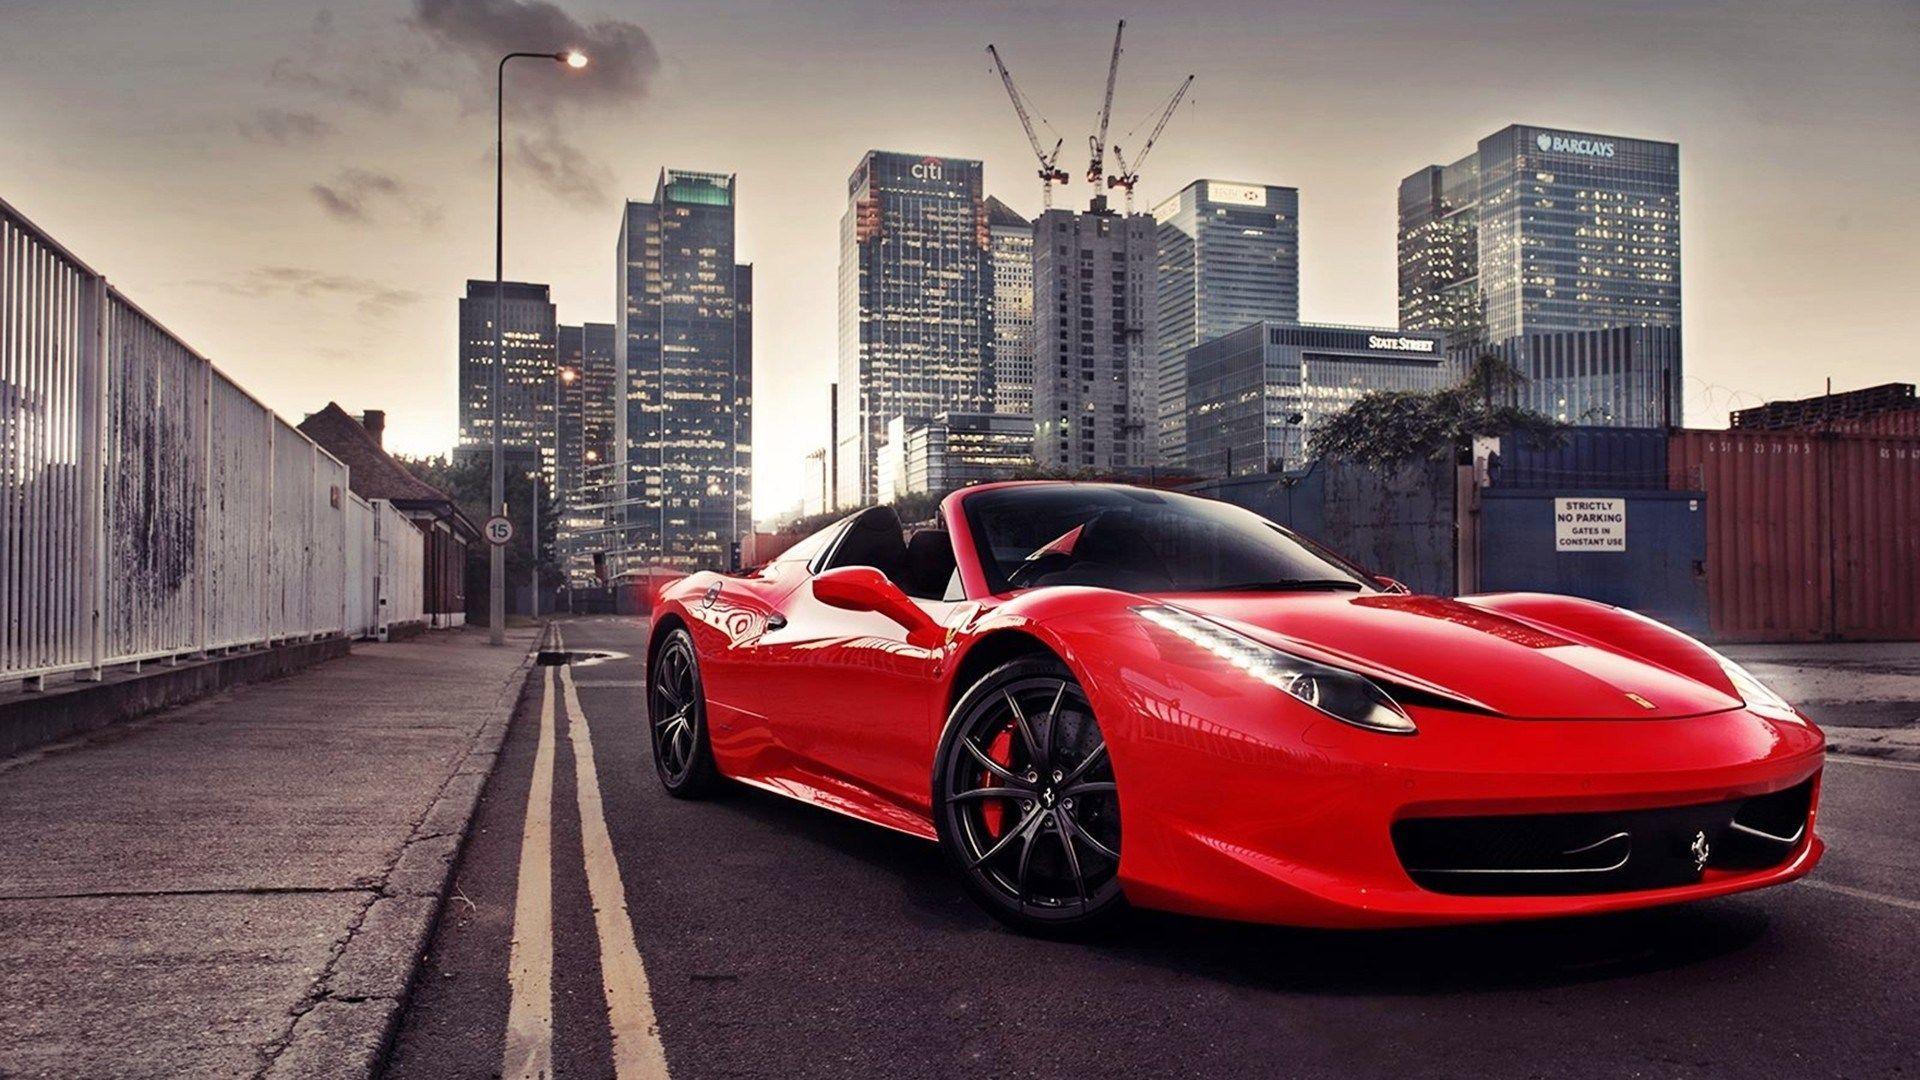 Ferrari Wallpapers 458 Photo Vehicles Wallpapers